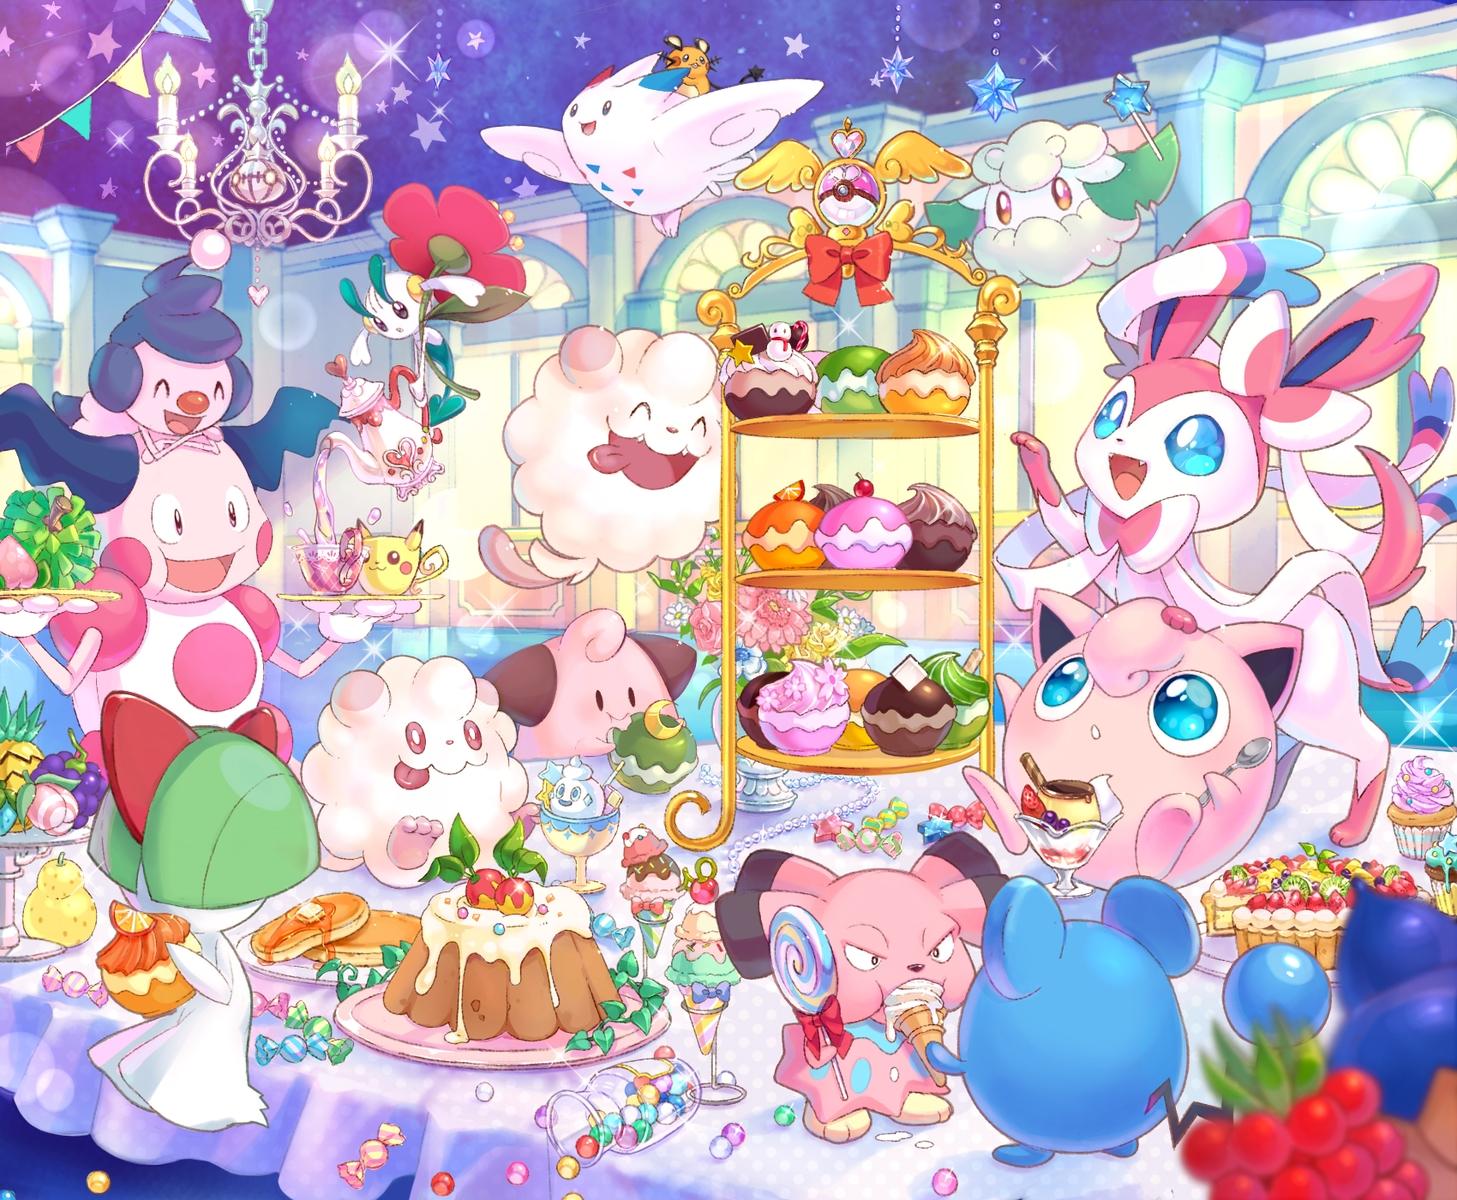 blue_eyes cake candy chandelure cottonee dedenne drink floette food fruit ice_cream marill mime_jr mr_mime pikachu pokemon ralts shiori_(xxxsi) slurpuff swirlix sylveon togekiss vanillite